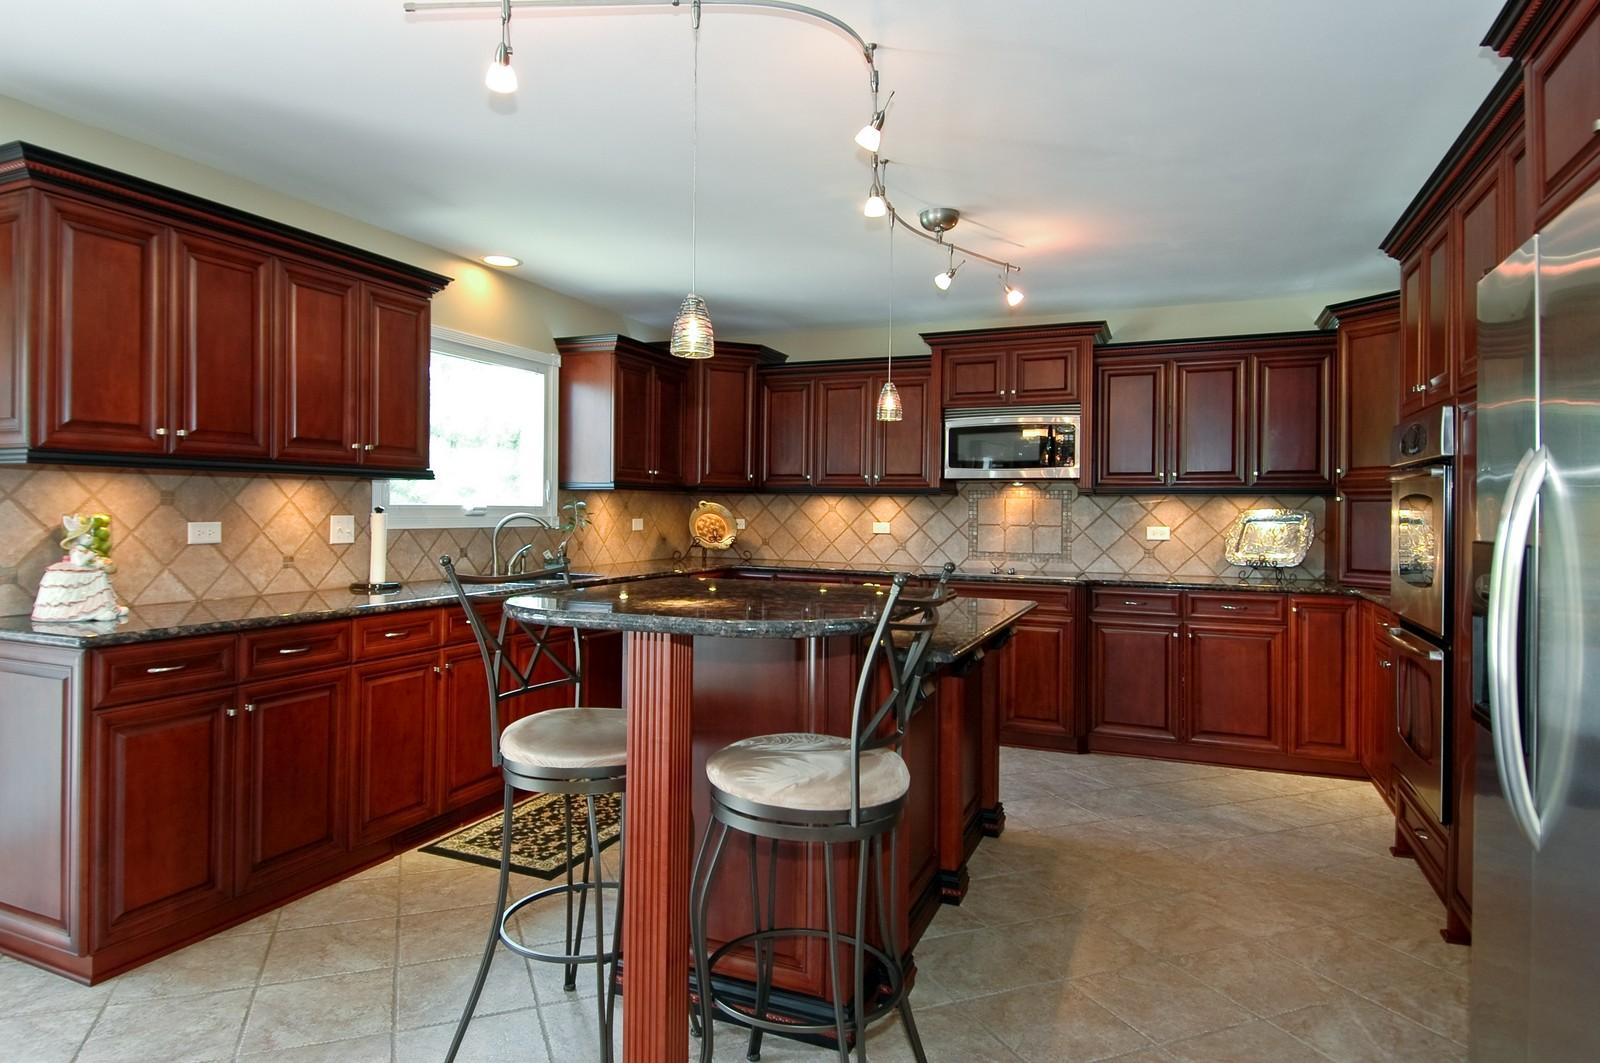 Real Estate Photography - 9015 Loch Glen Dr, Lakewood, IL, 60014 - Kitchen